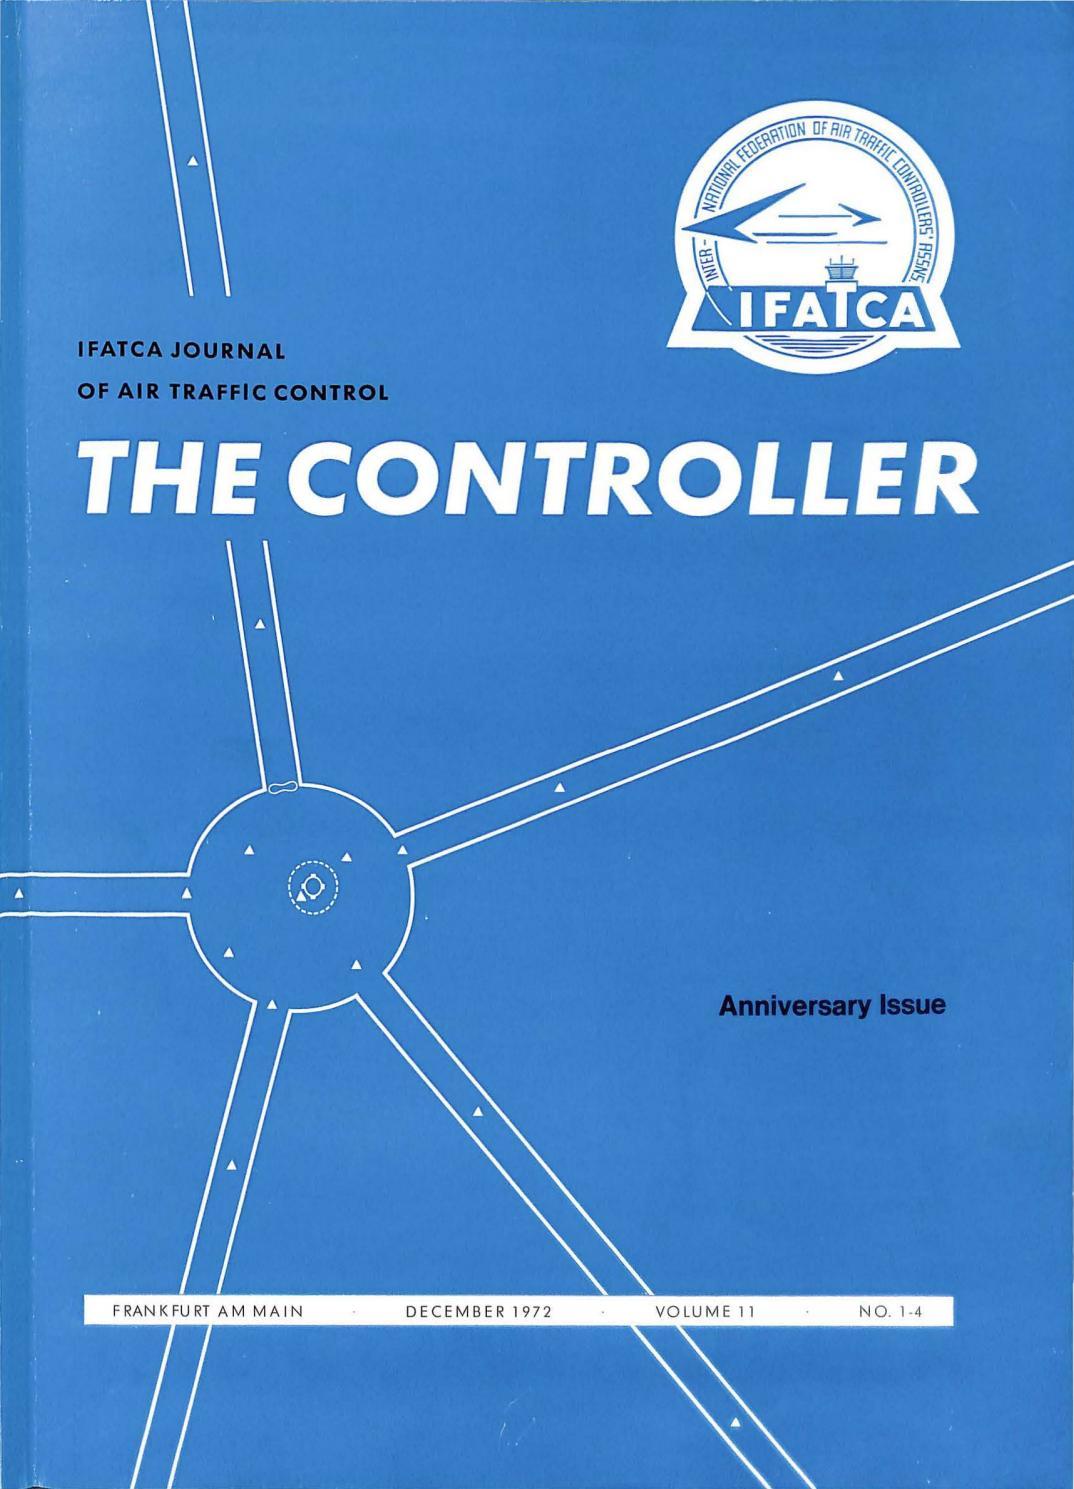 IFATCA - The Controller - 1972 by IFATCA - issuu